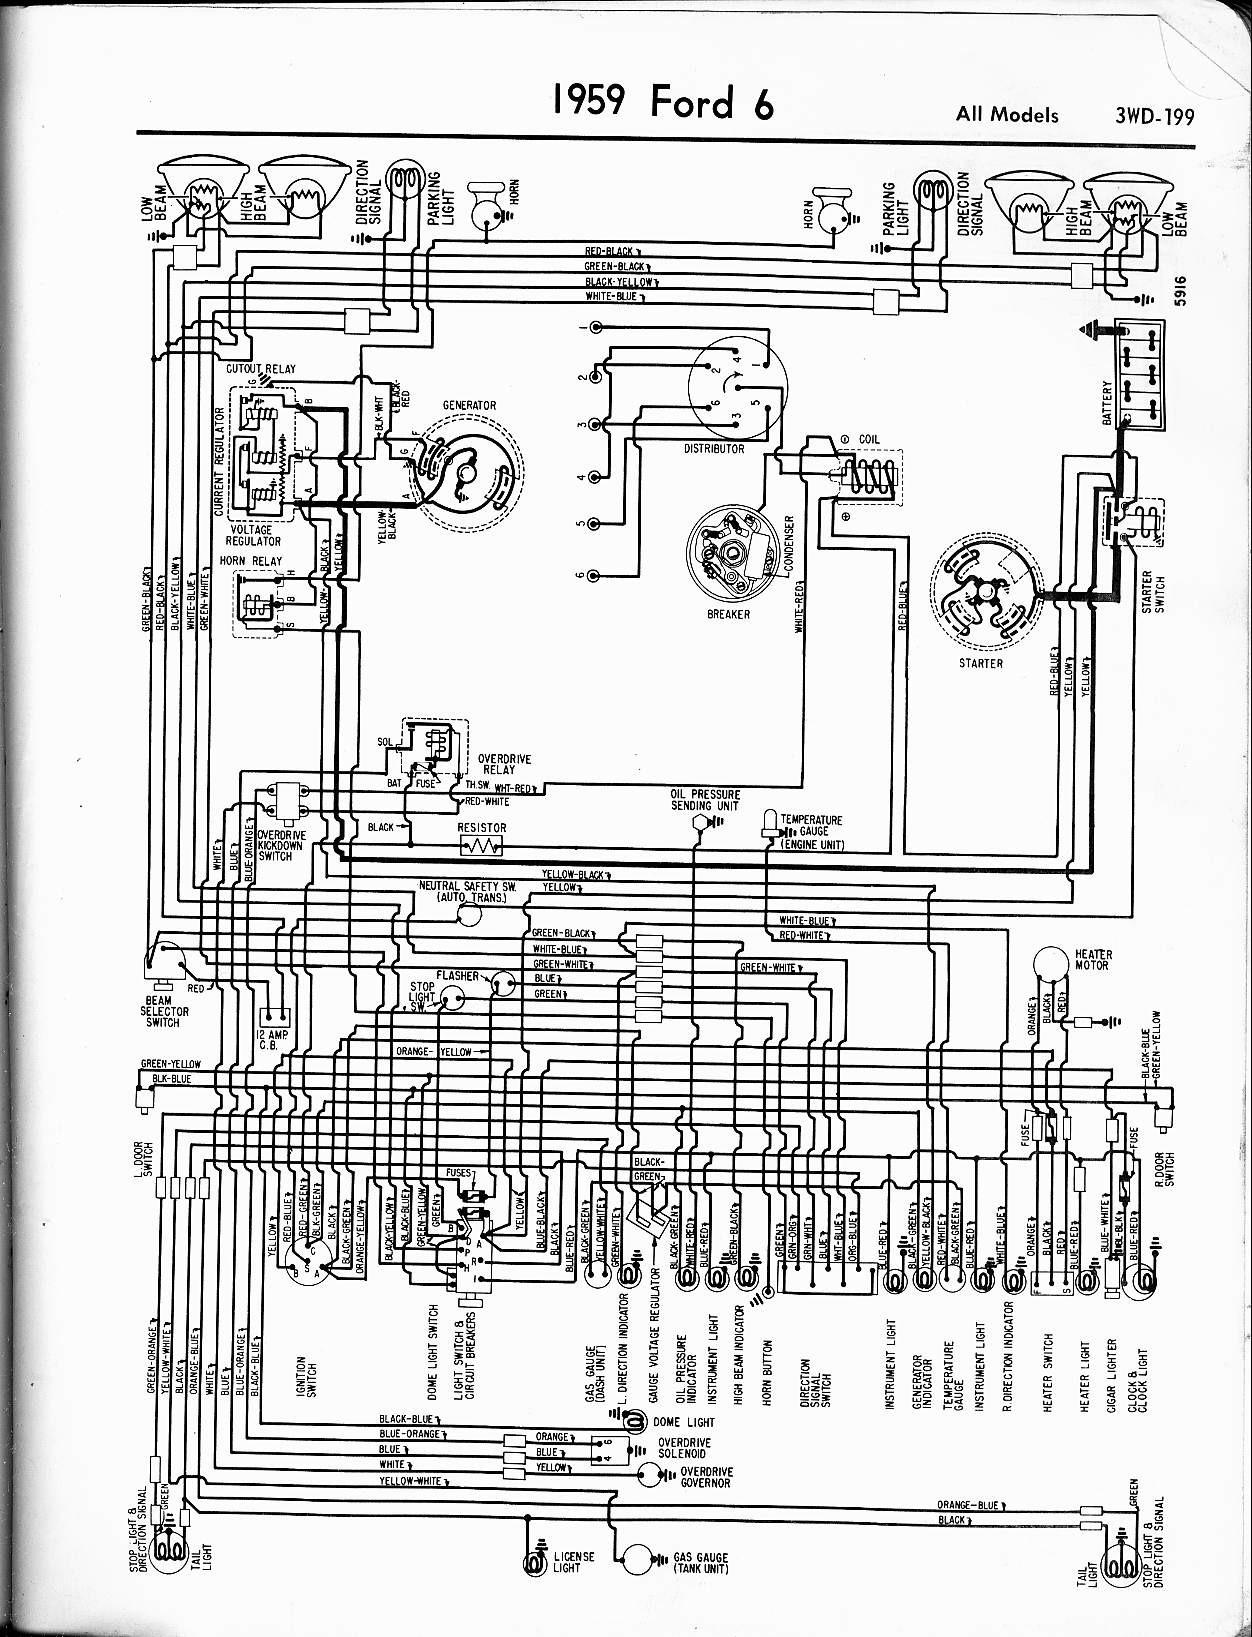 1959 Ford F100 Tail Light Wiring Diagram Smart Diagrams 1974 Truck Elegant Brake Rh Detoxicrecenze Com 1963